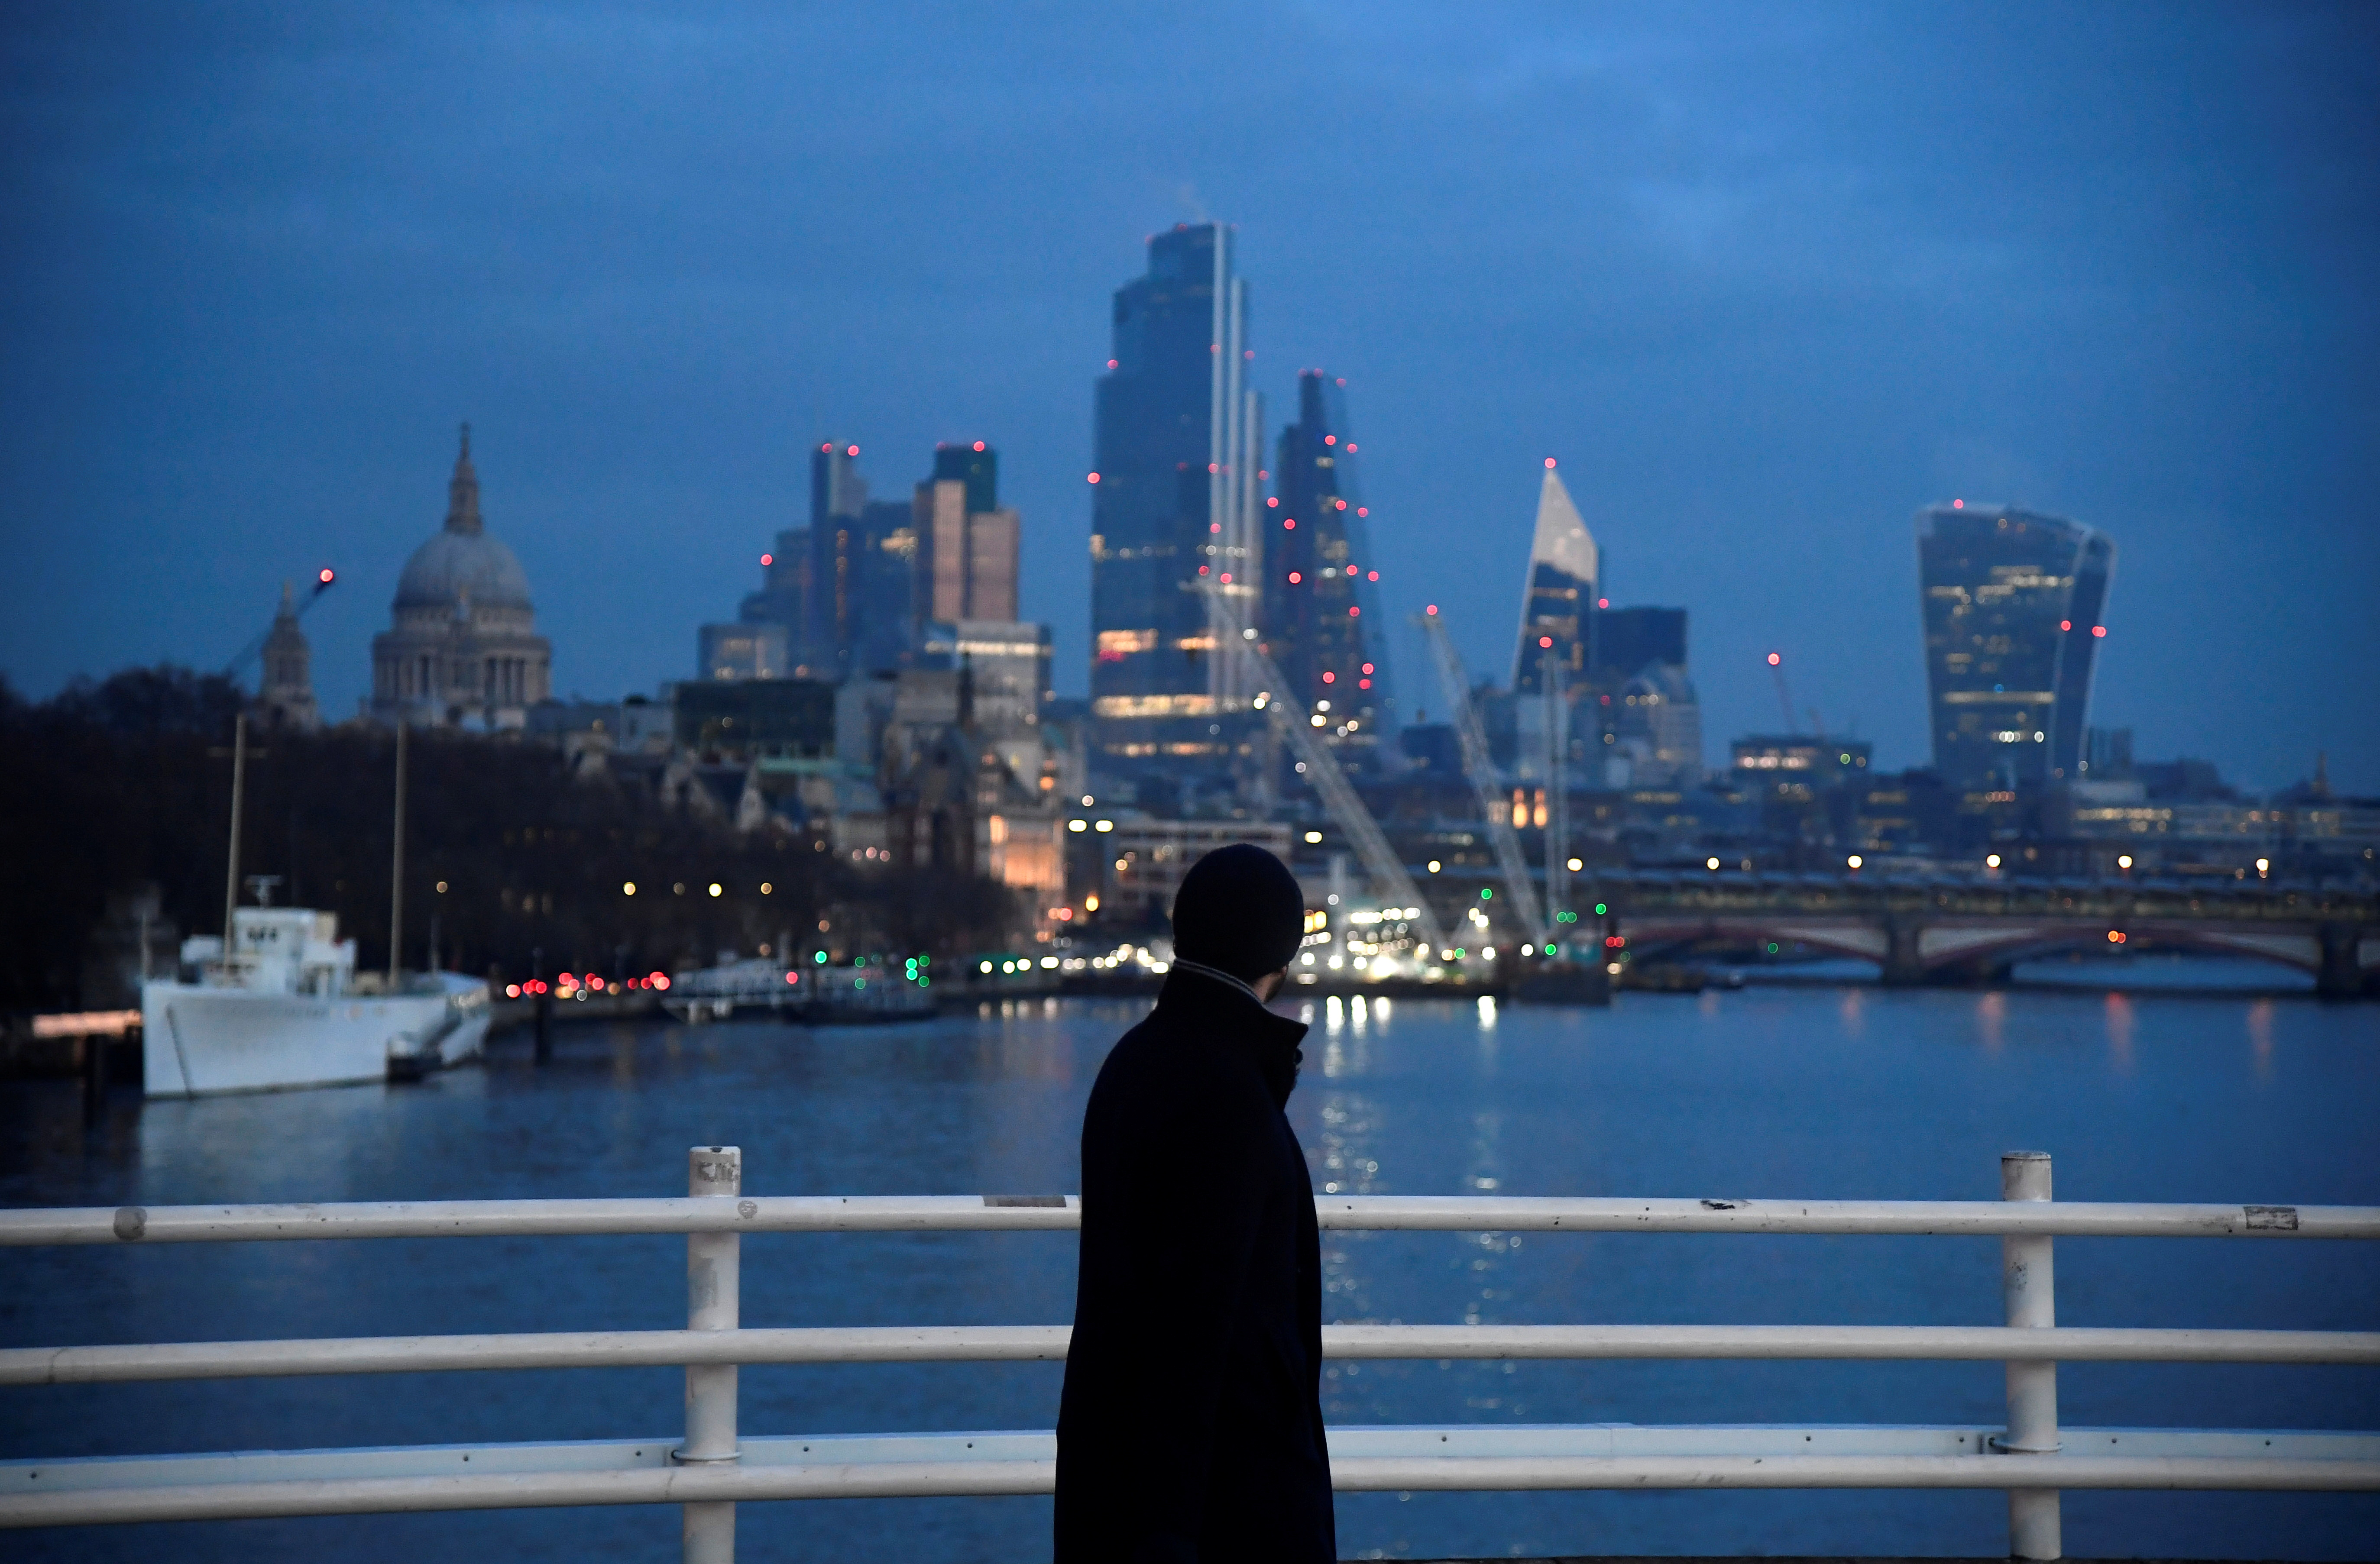 A man looks towards skyscrapers of the City of London financial district as he crosses Waterloo Bridge, amid the coronavirus disease (COVID-19) pandemic, in London, Britain, January 15, 2021. REUTERS/Toby Melville